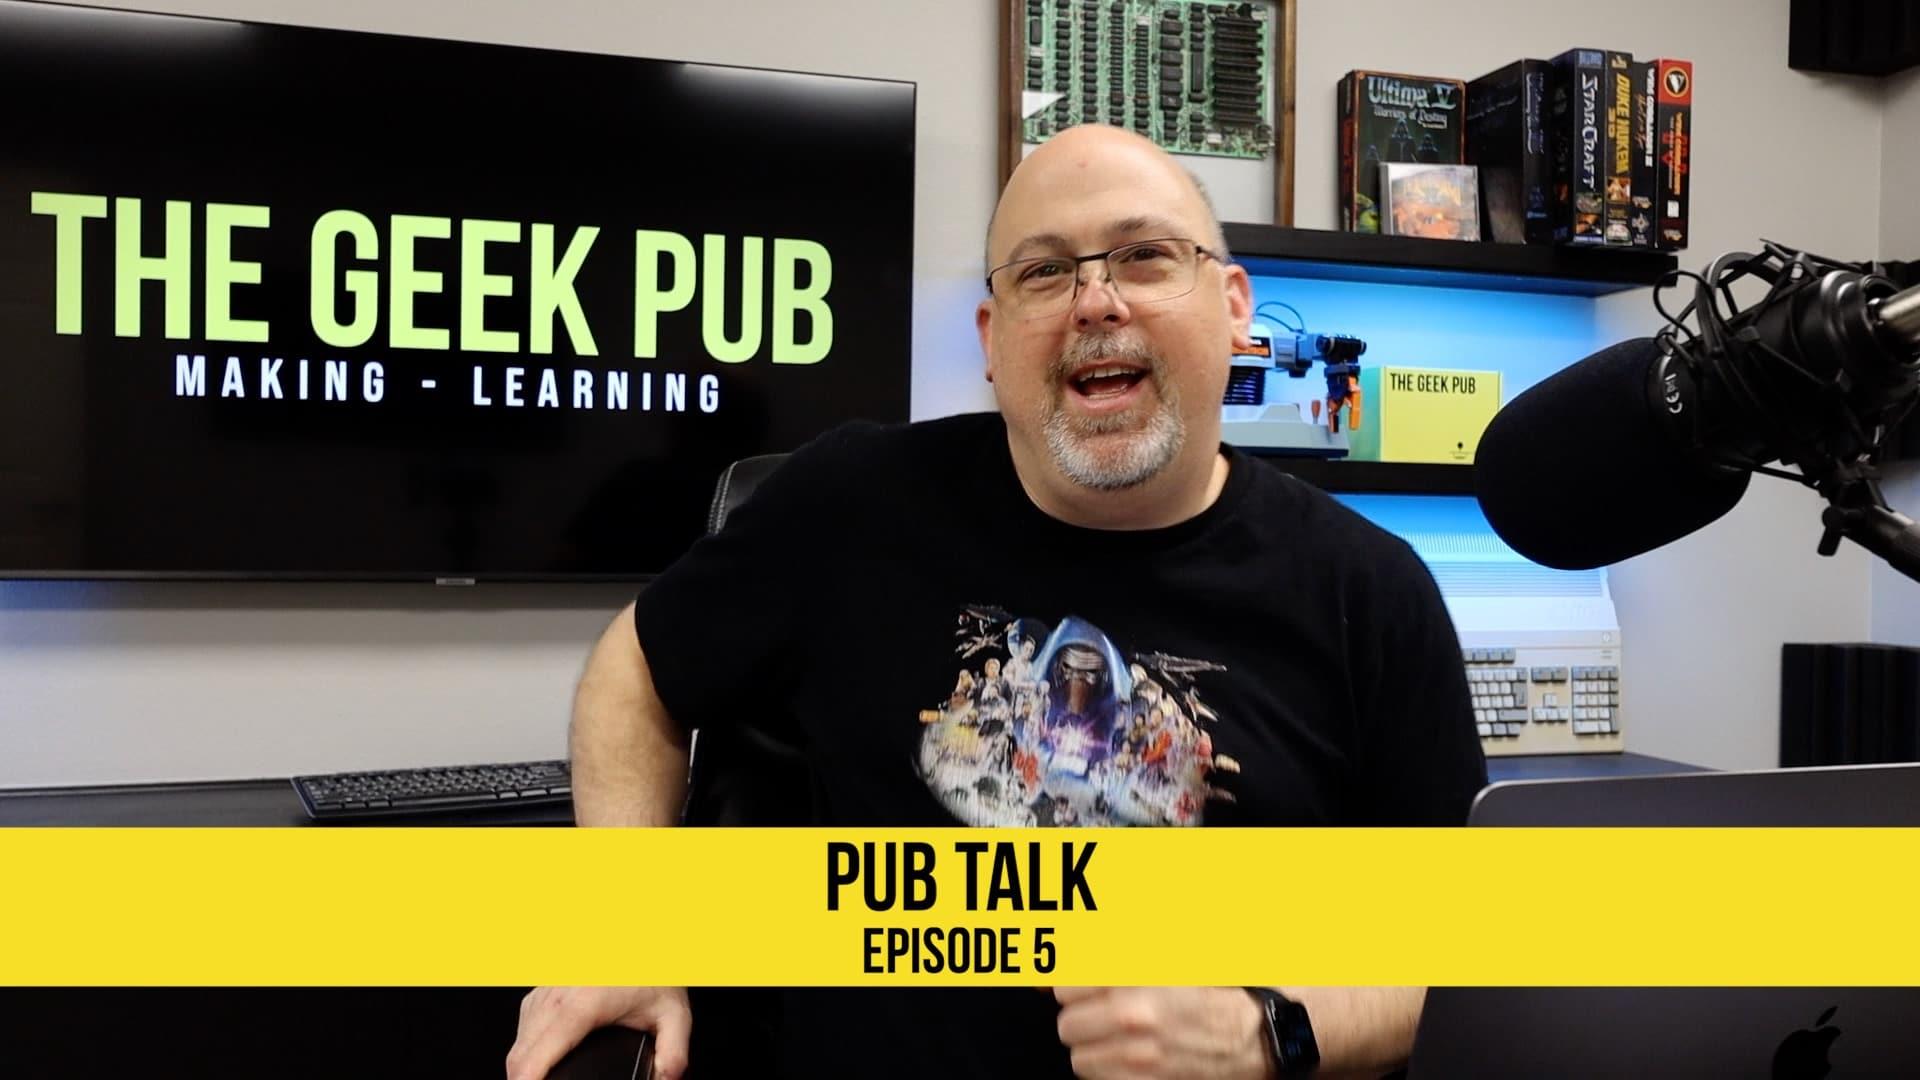 Pub Talk Episode 5